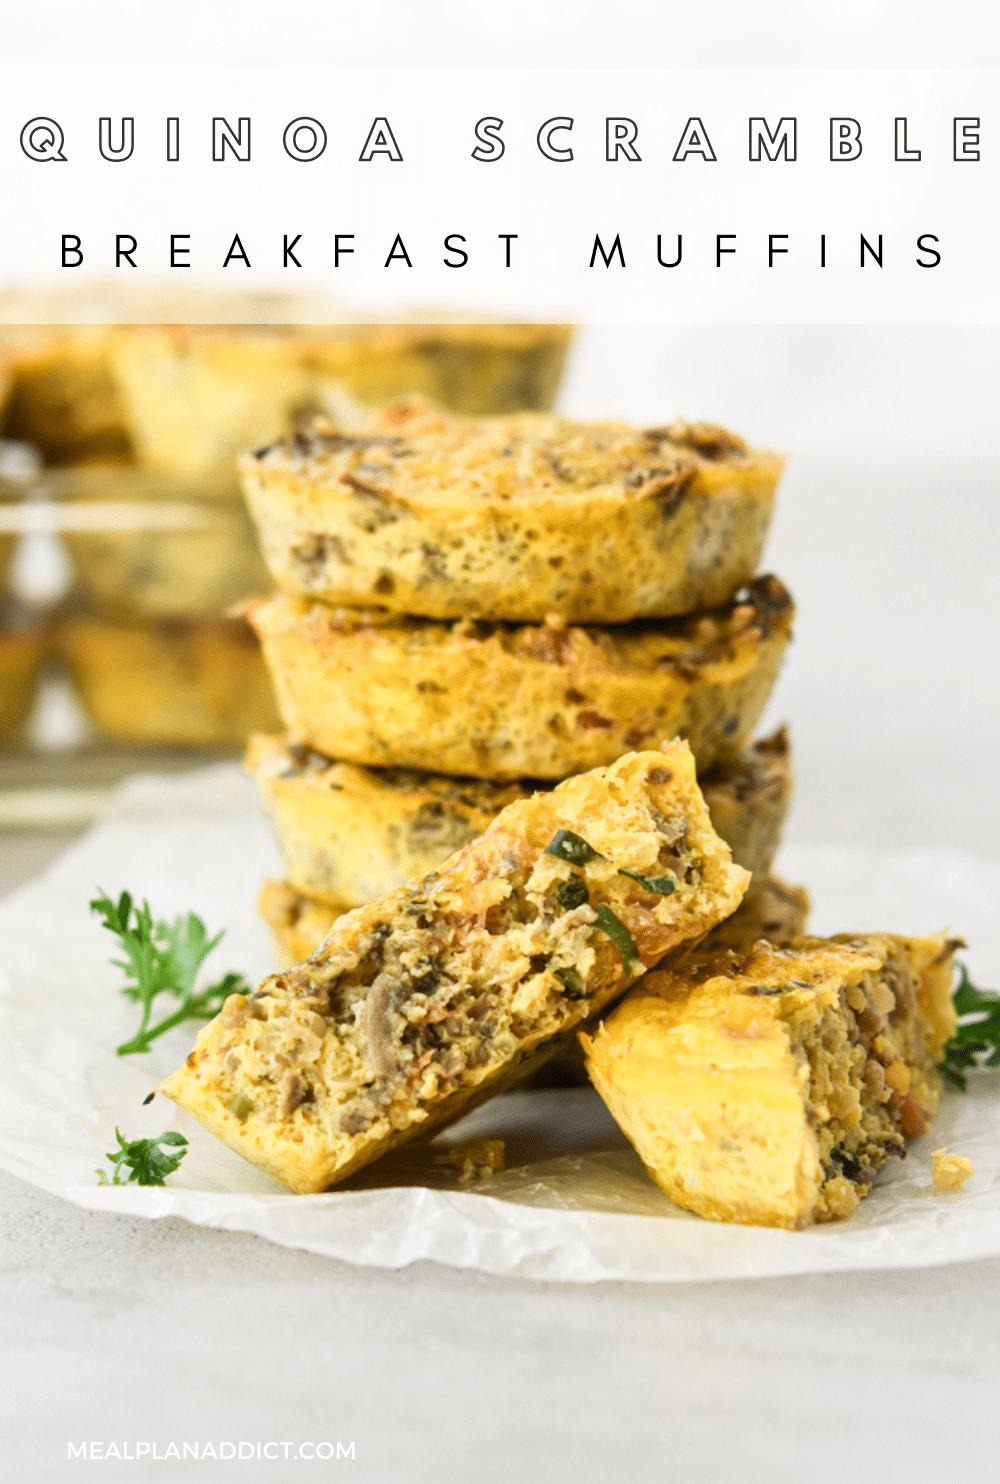 Breakfast muffin pin for Pinterest